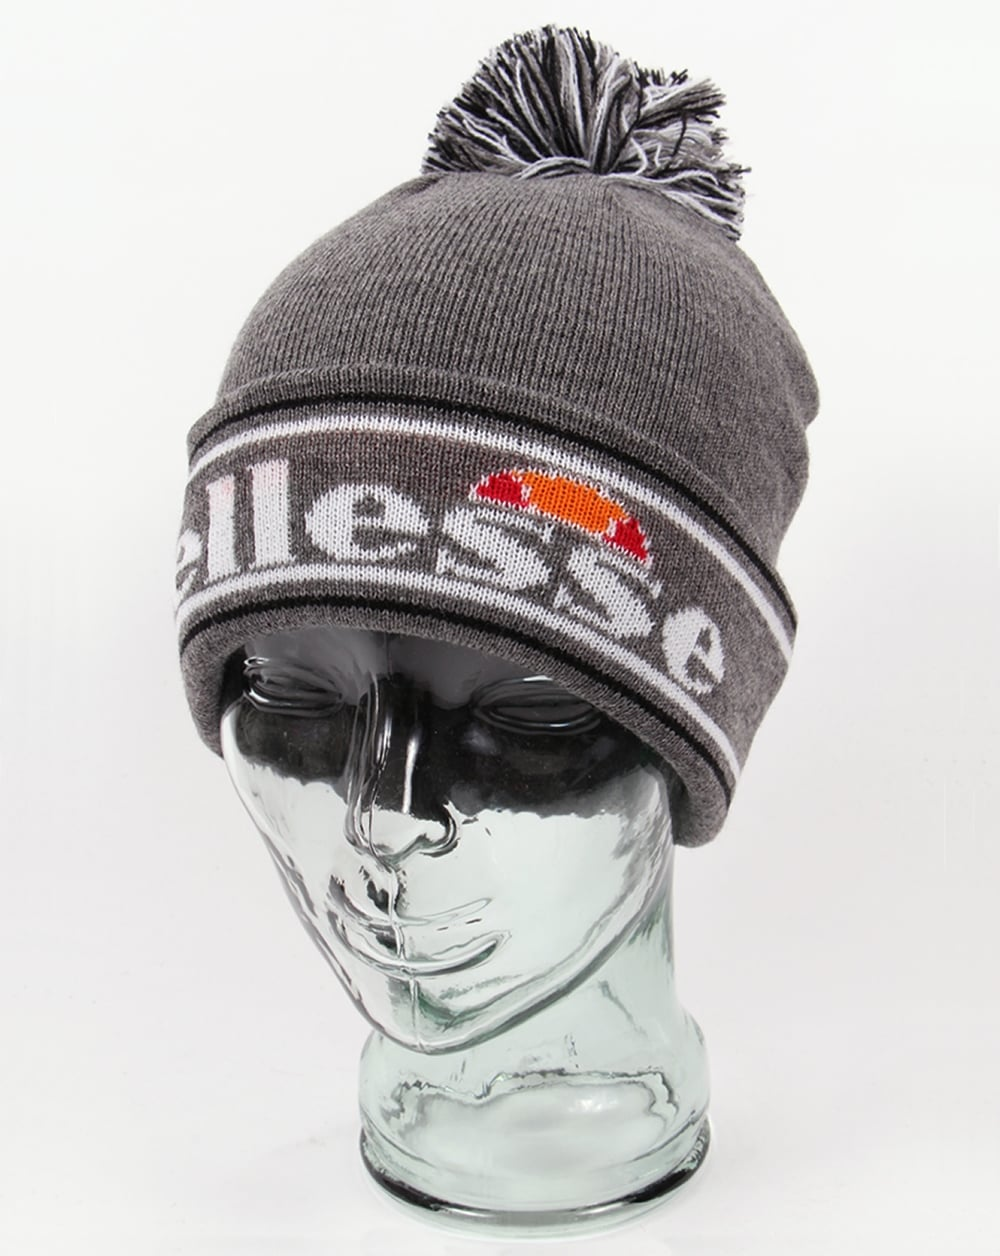 cf4ba641bf0c5d Ellesse Monza Beanie Grey,hat,wool,pom pom,winter